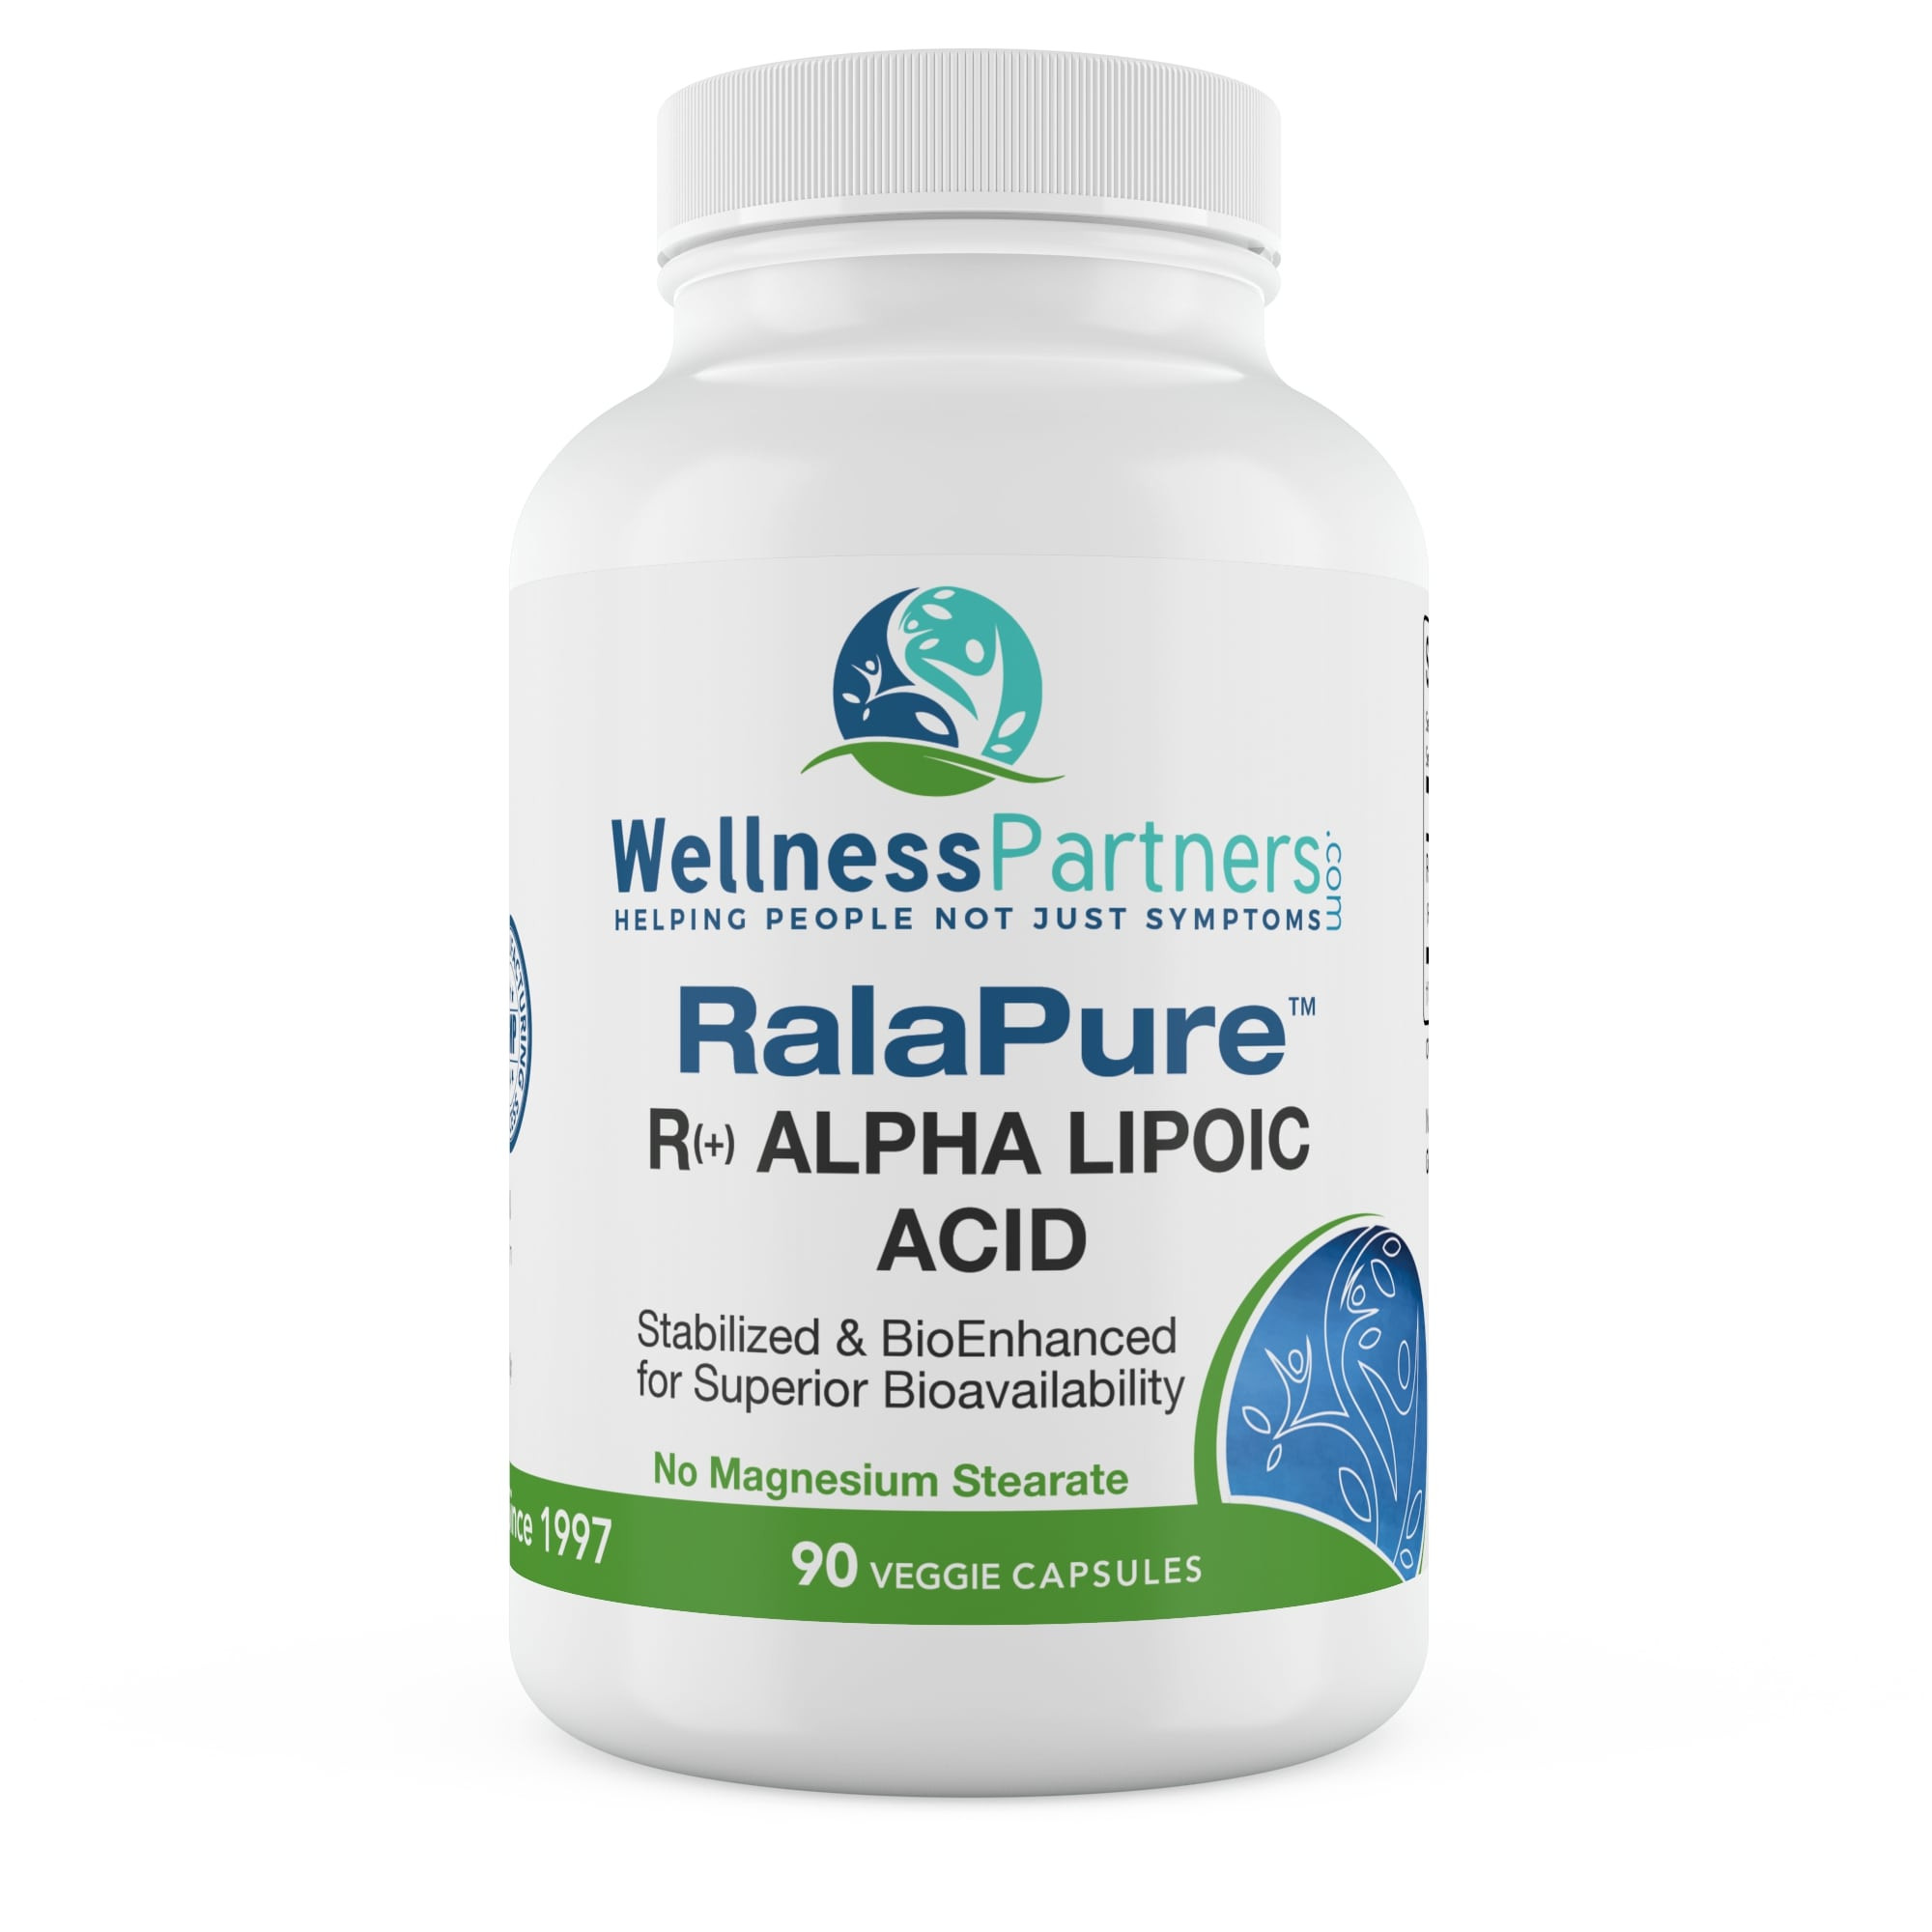 RalaPure Stabilized R-Alpha Lipoic Acid - ALA